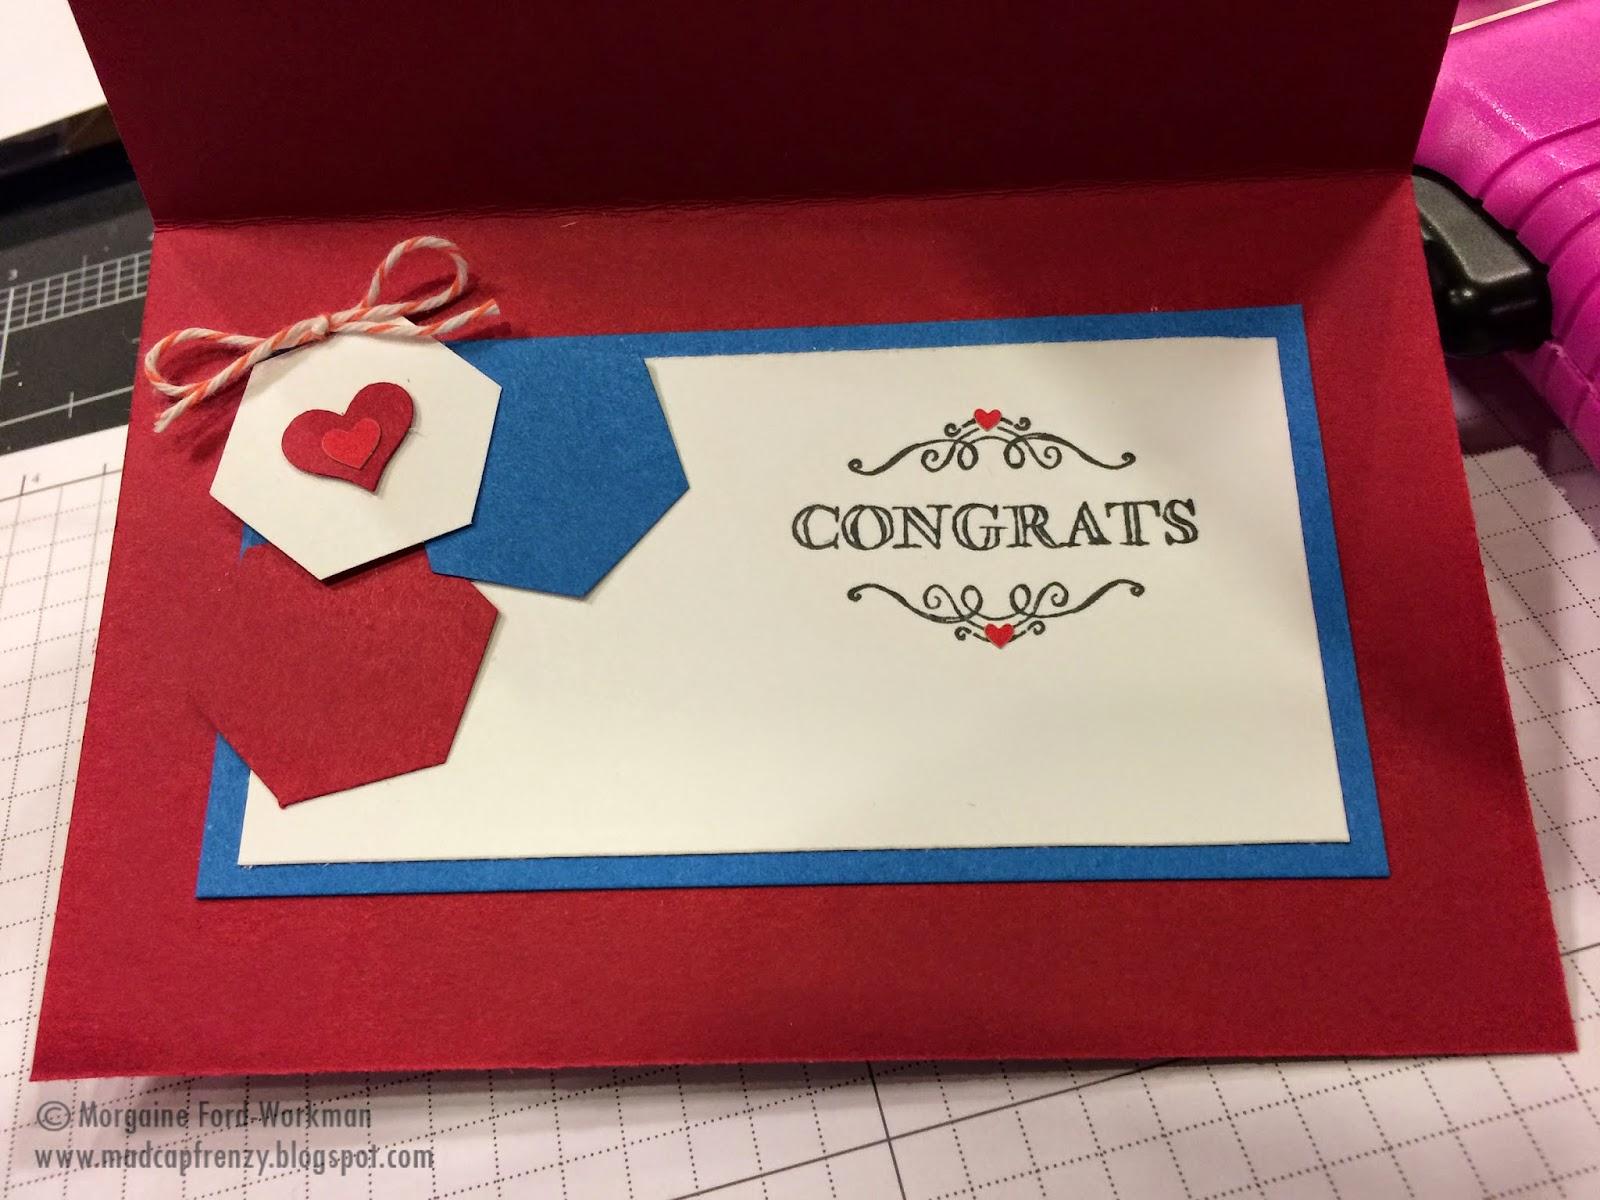 Madcap Frenzy's wedding card inside